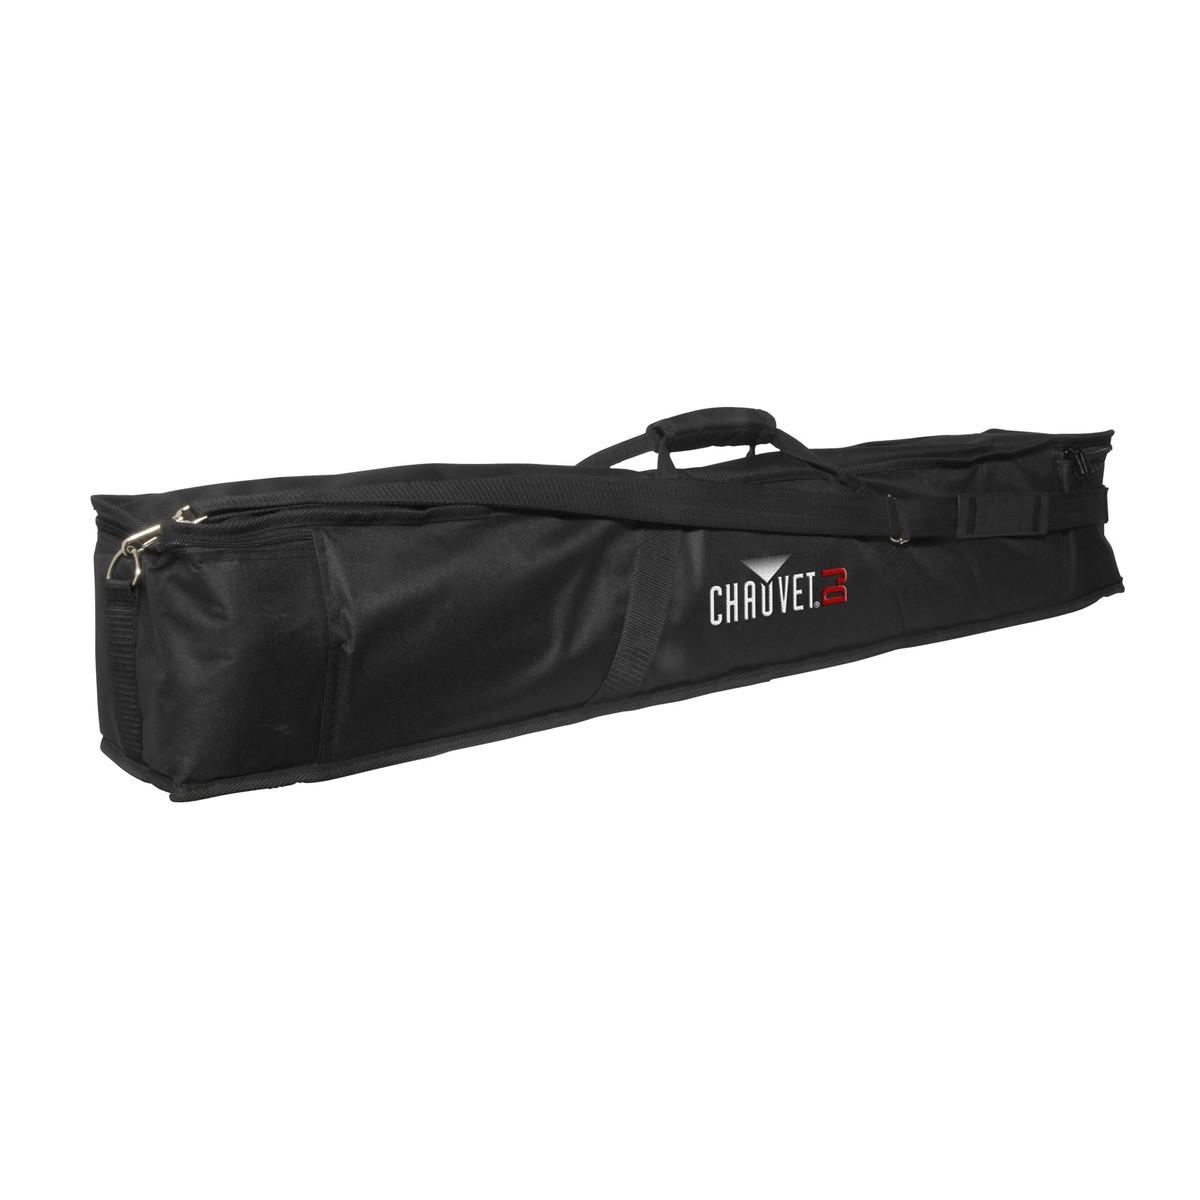 Chauvet VIP Gear taske til LED stribe lys hos Gear4Music.com